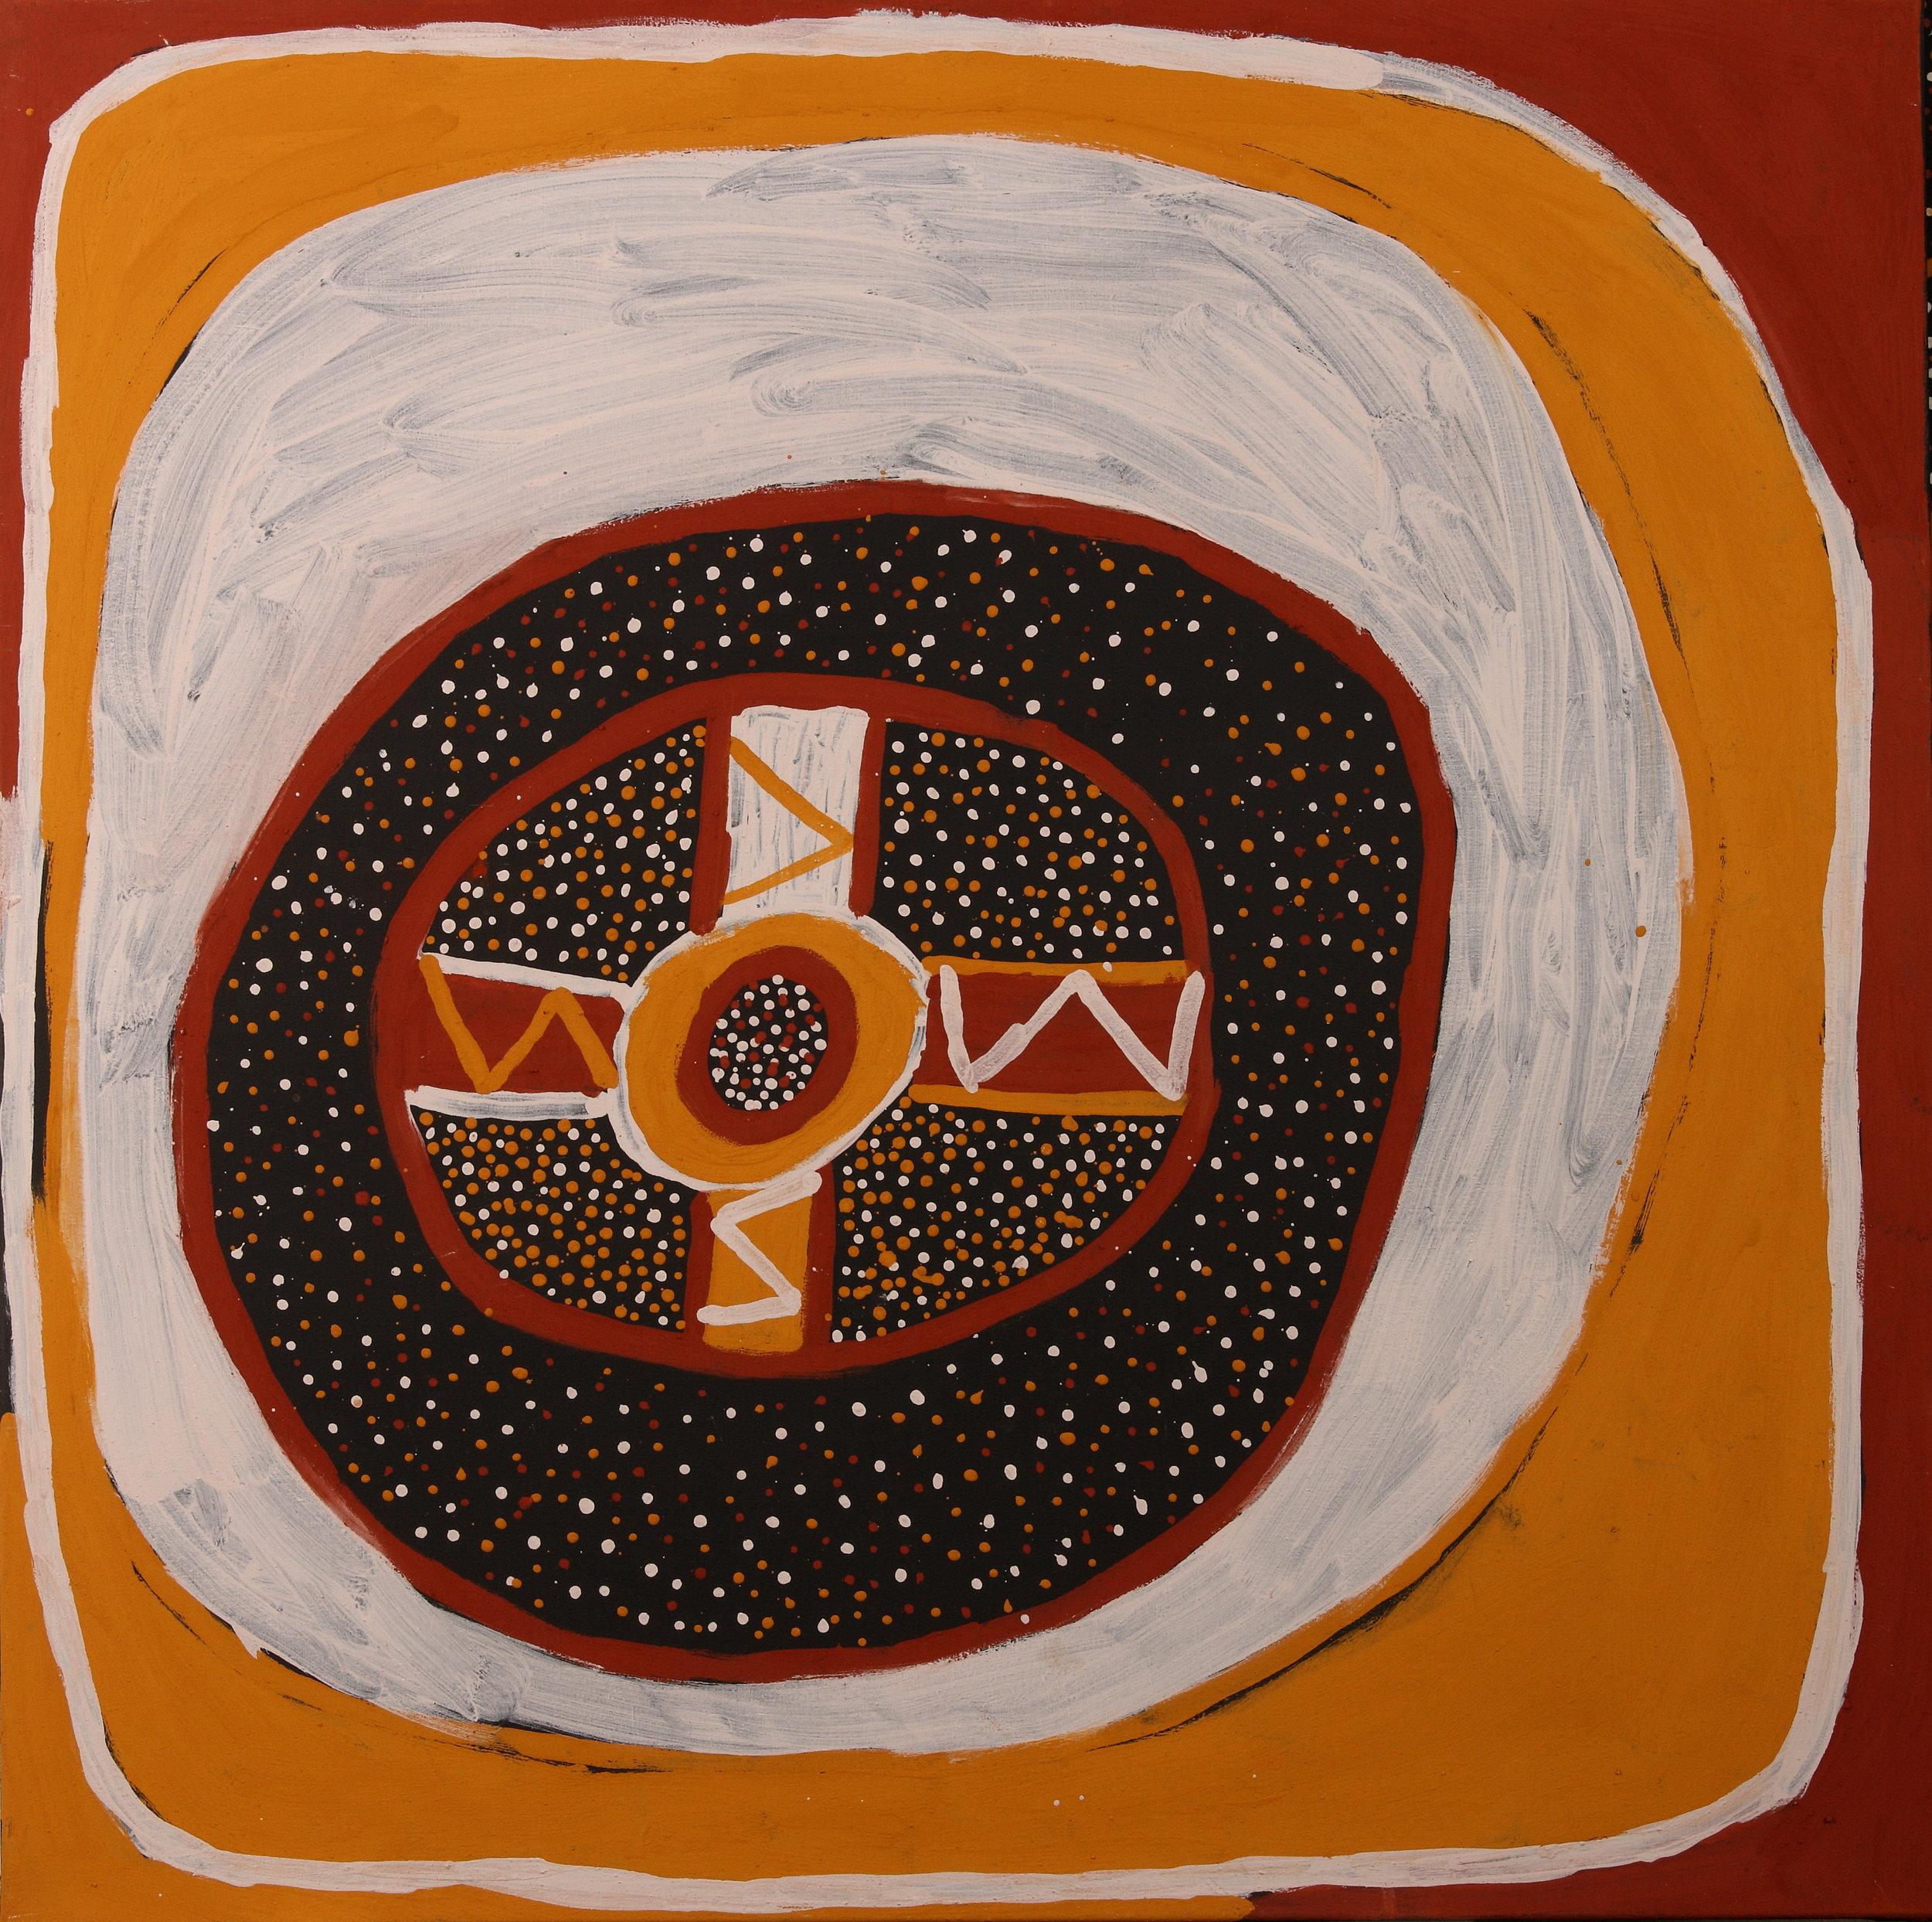 Kulama, 2012  natural earth pigments on linen 47 x 47 inches (120 x 120 cm)   Jilamara Arts & Crafts Catalog #20-12     EMAIL INQUIRY